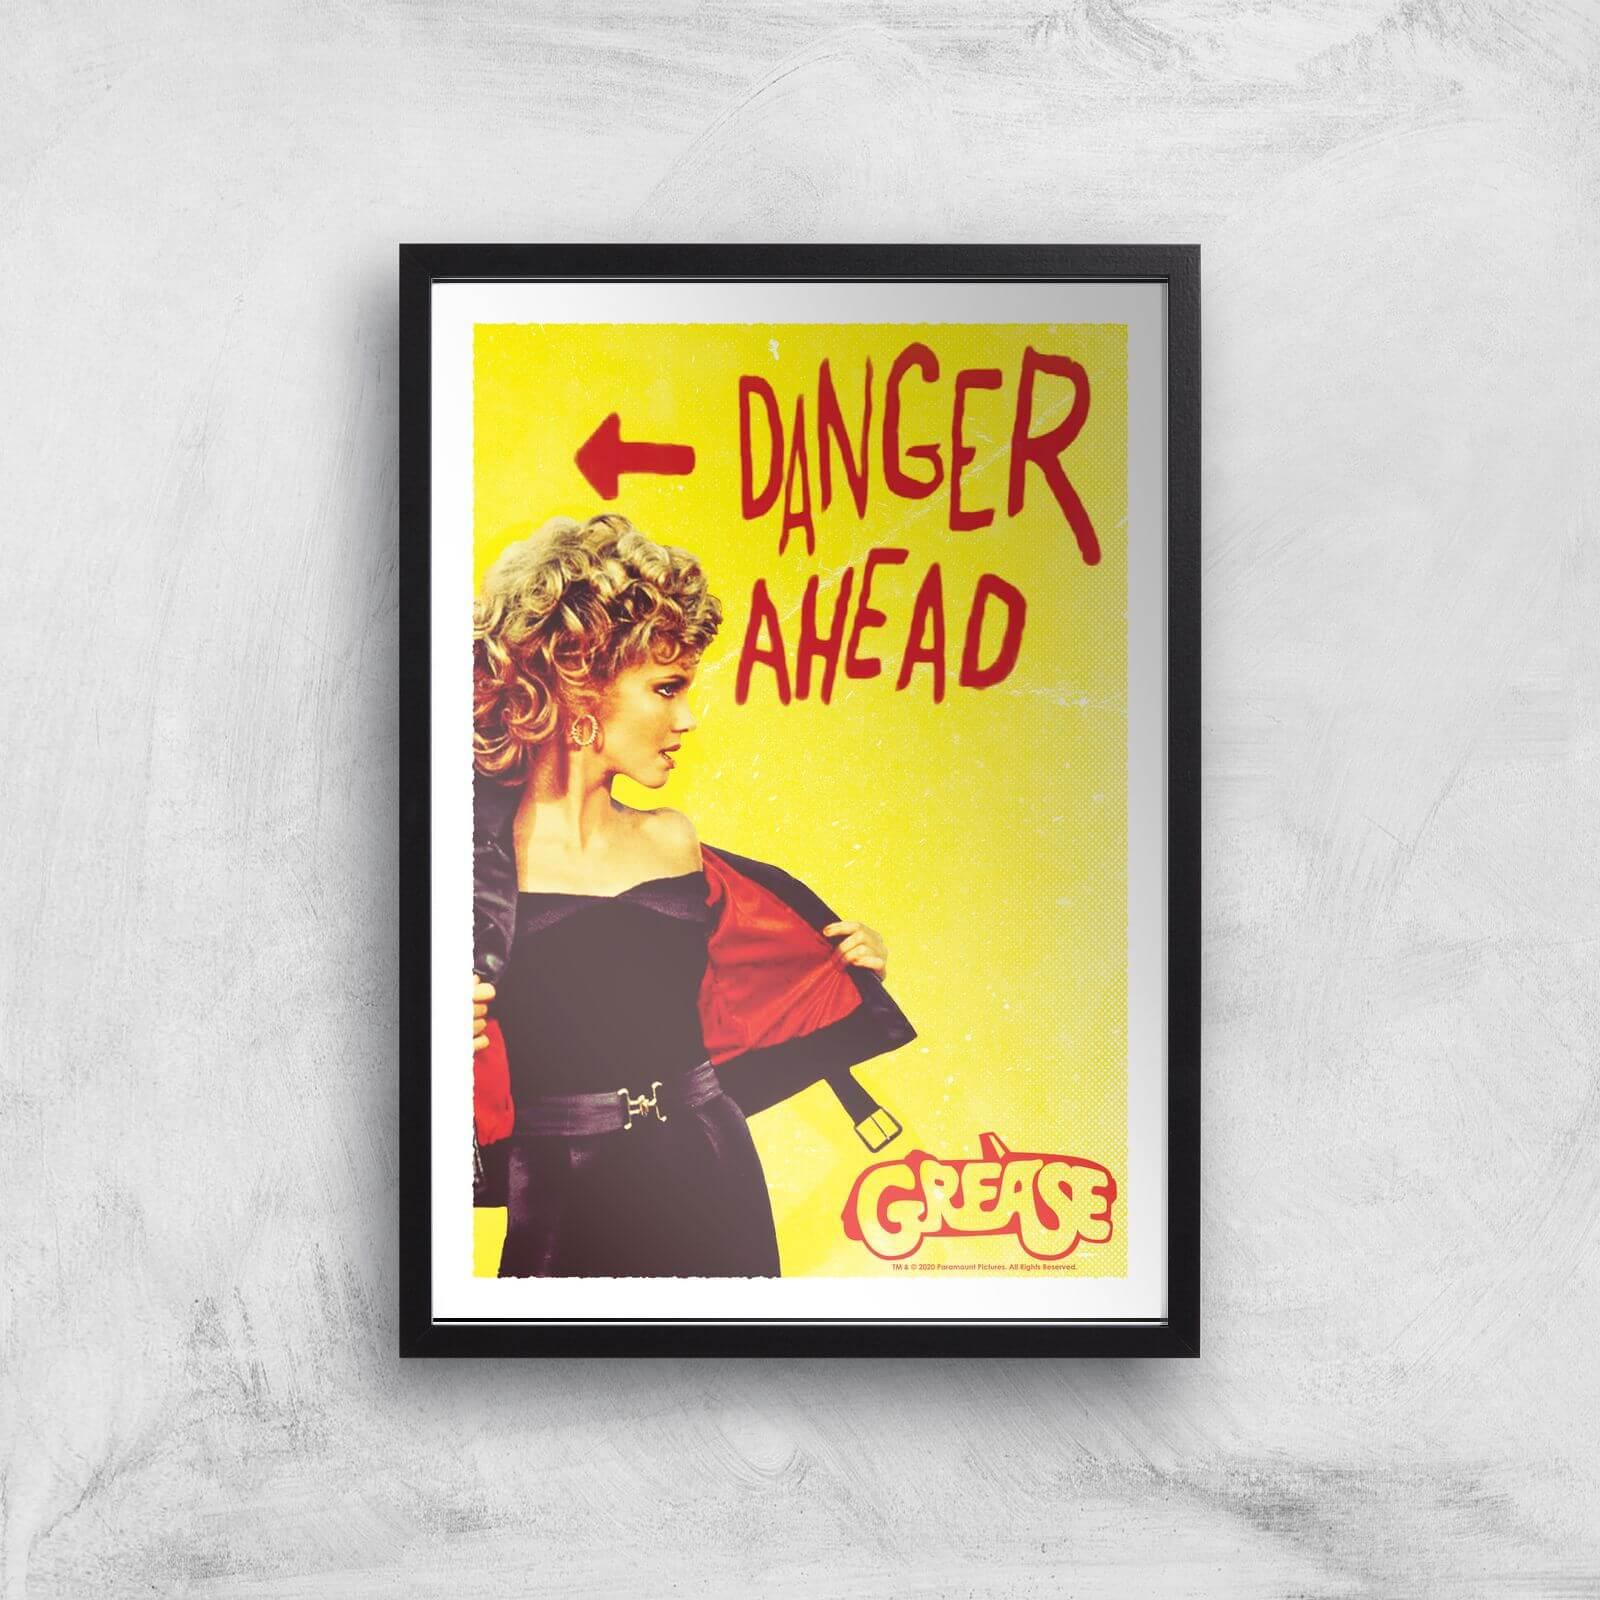 Grease Danger Road Giclee Art Print - A2 - Black Frame